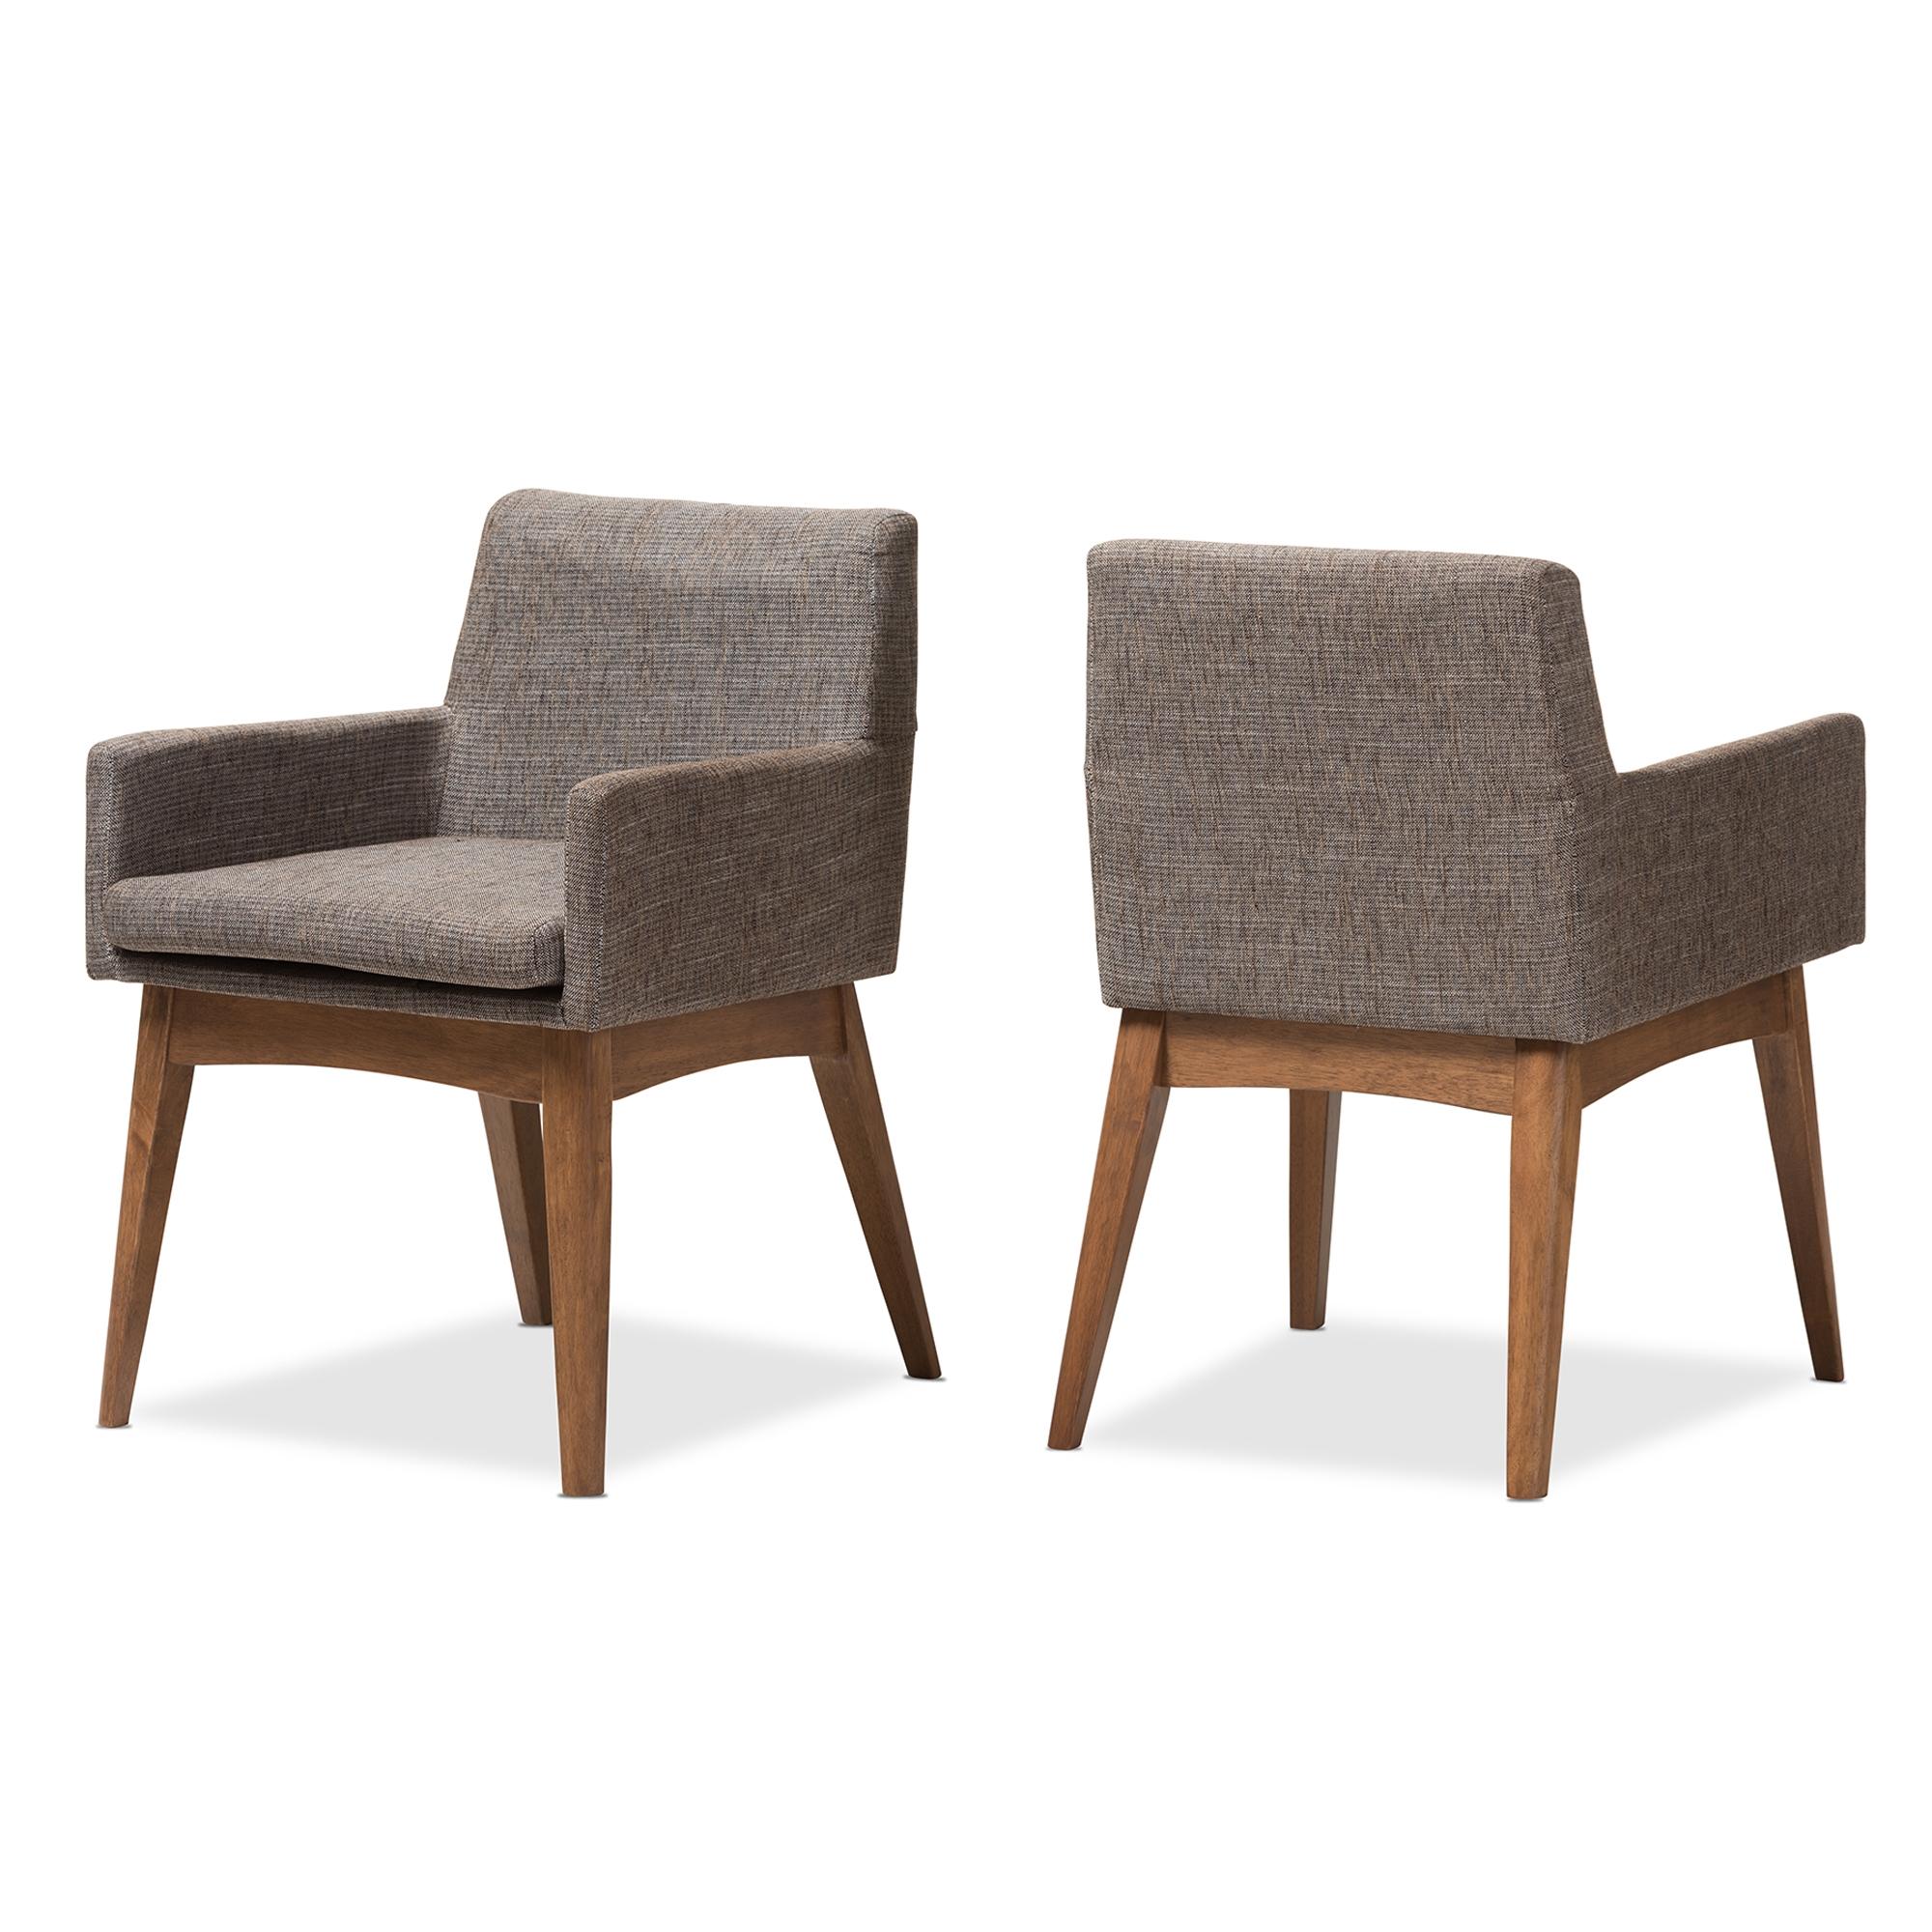 Baxton Studio Nexus Mid Century Modern Walnut Wood Finishing And Gravel  Fabric Upholstered Arm Chair ...